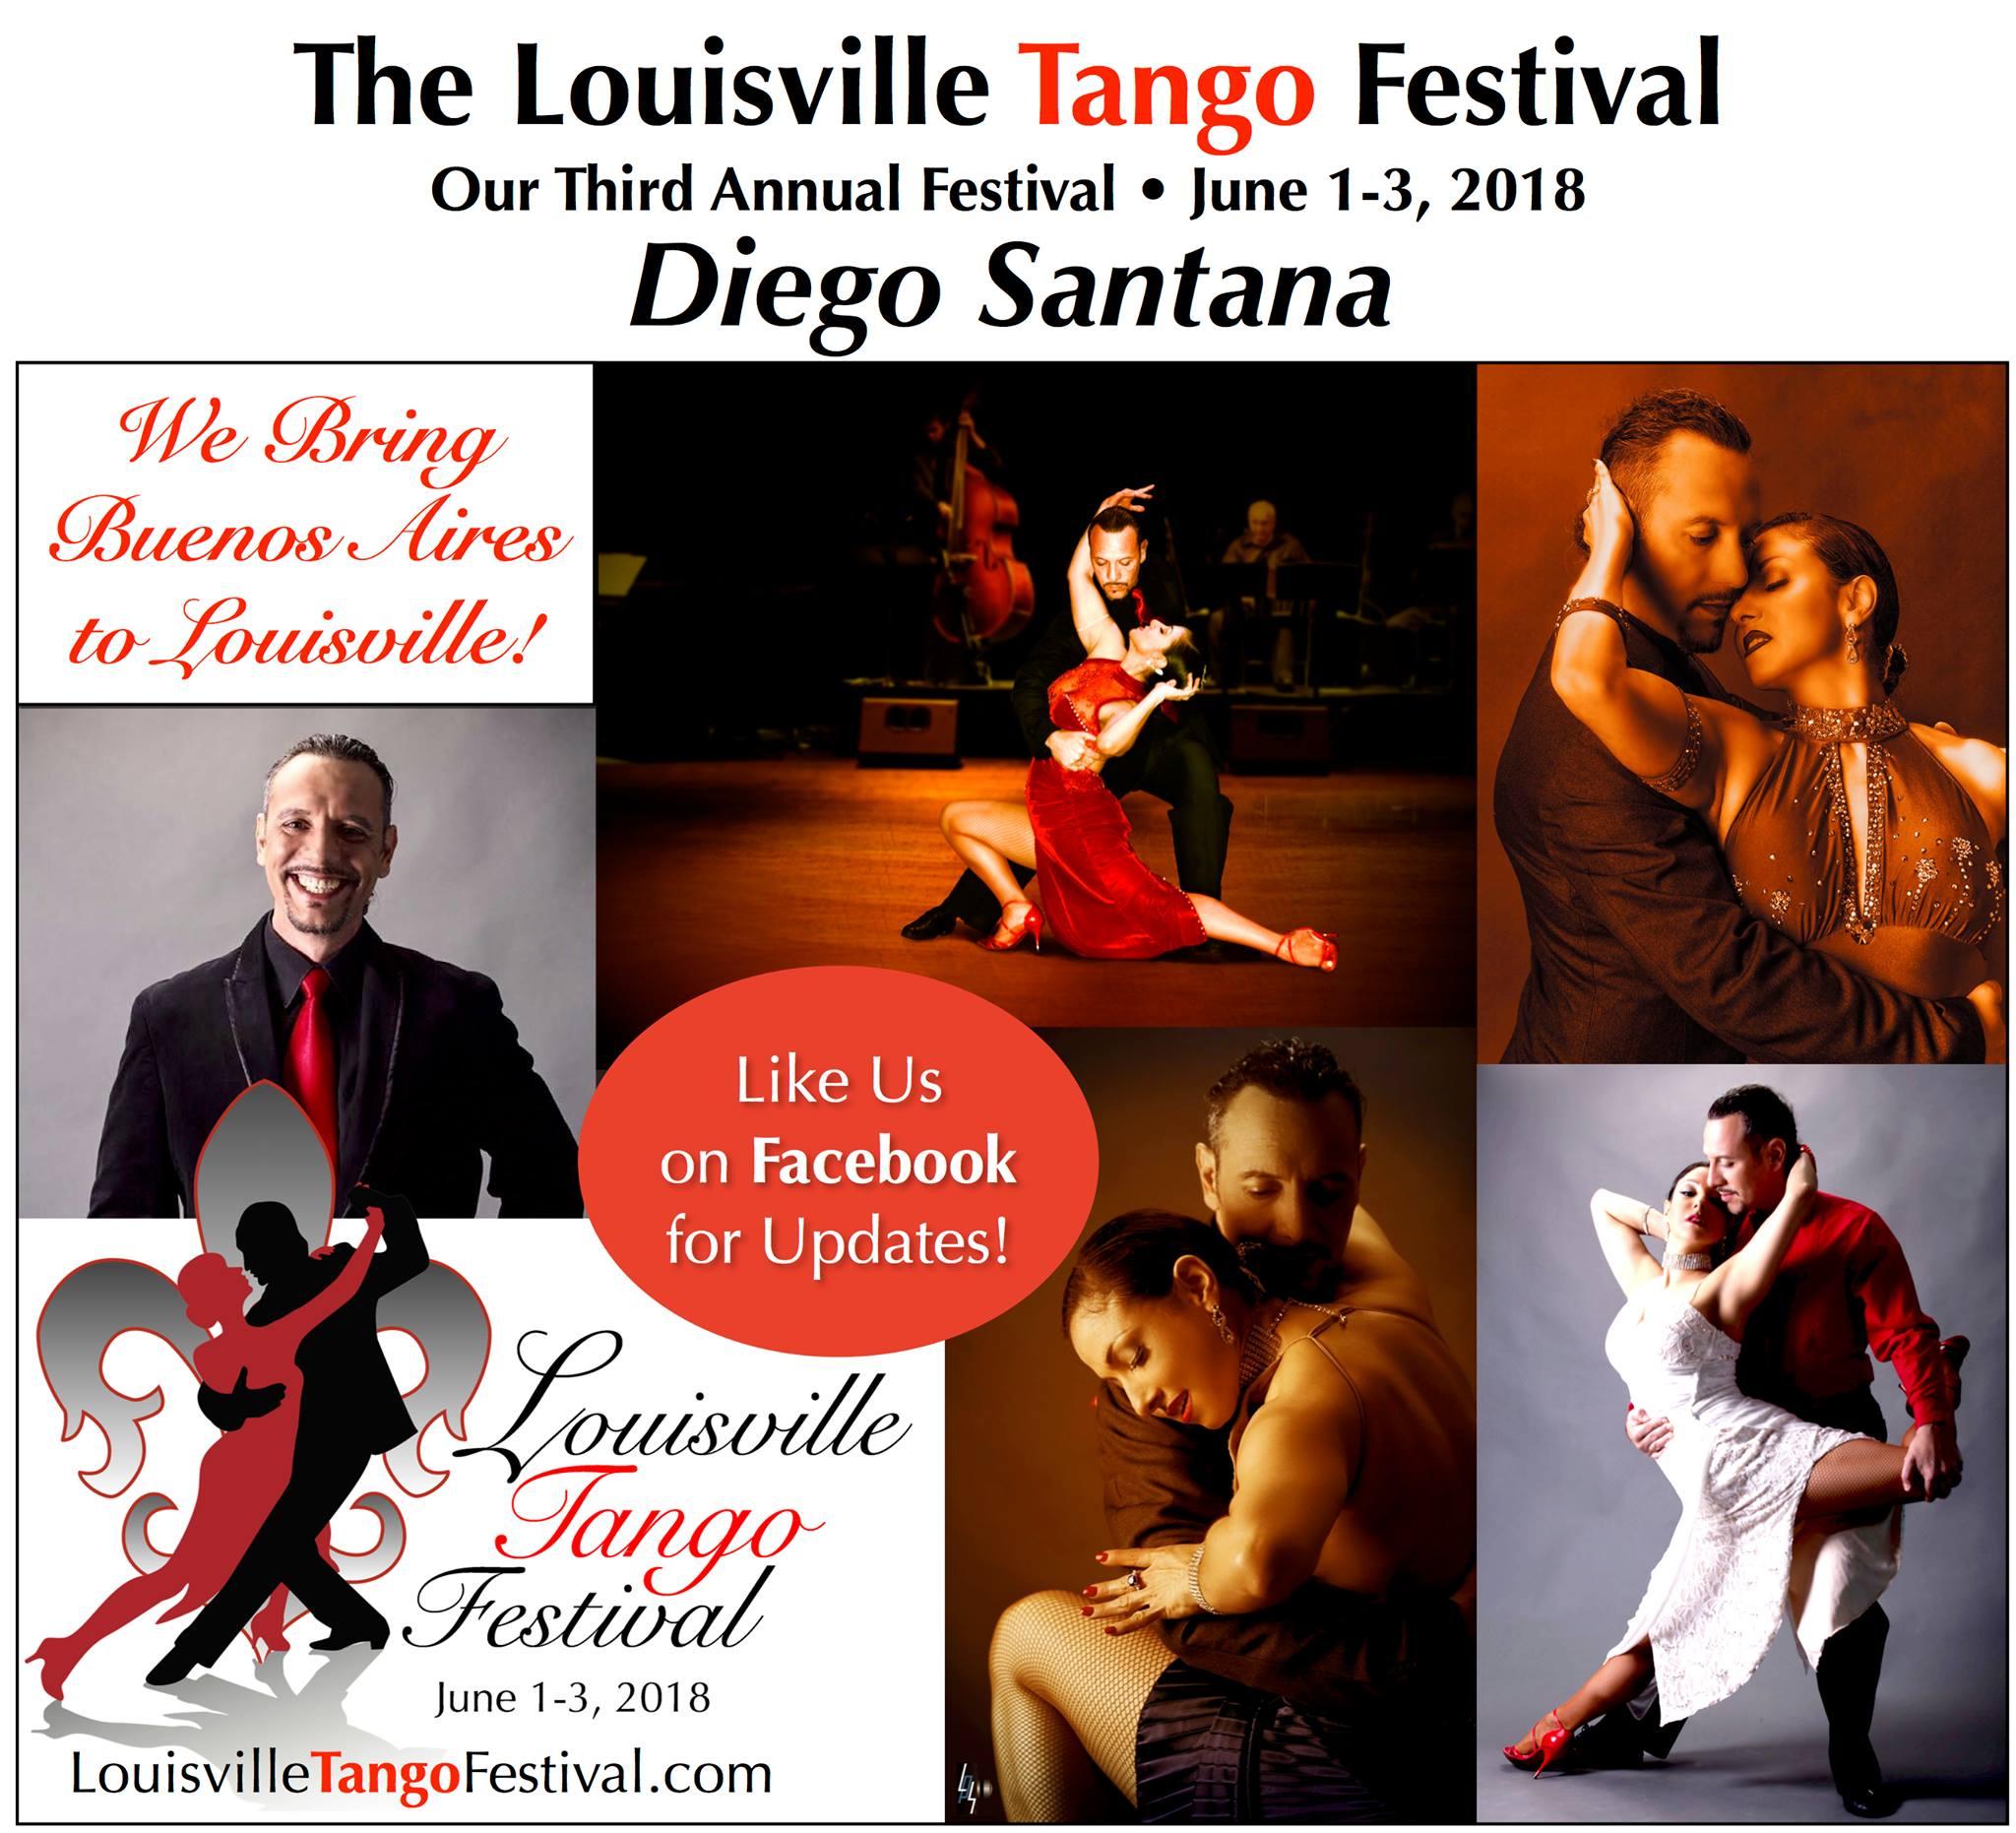 Louisville tango festival 2018